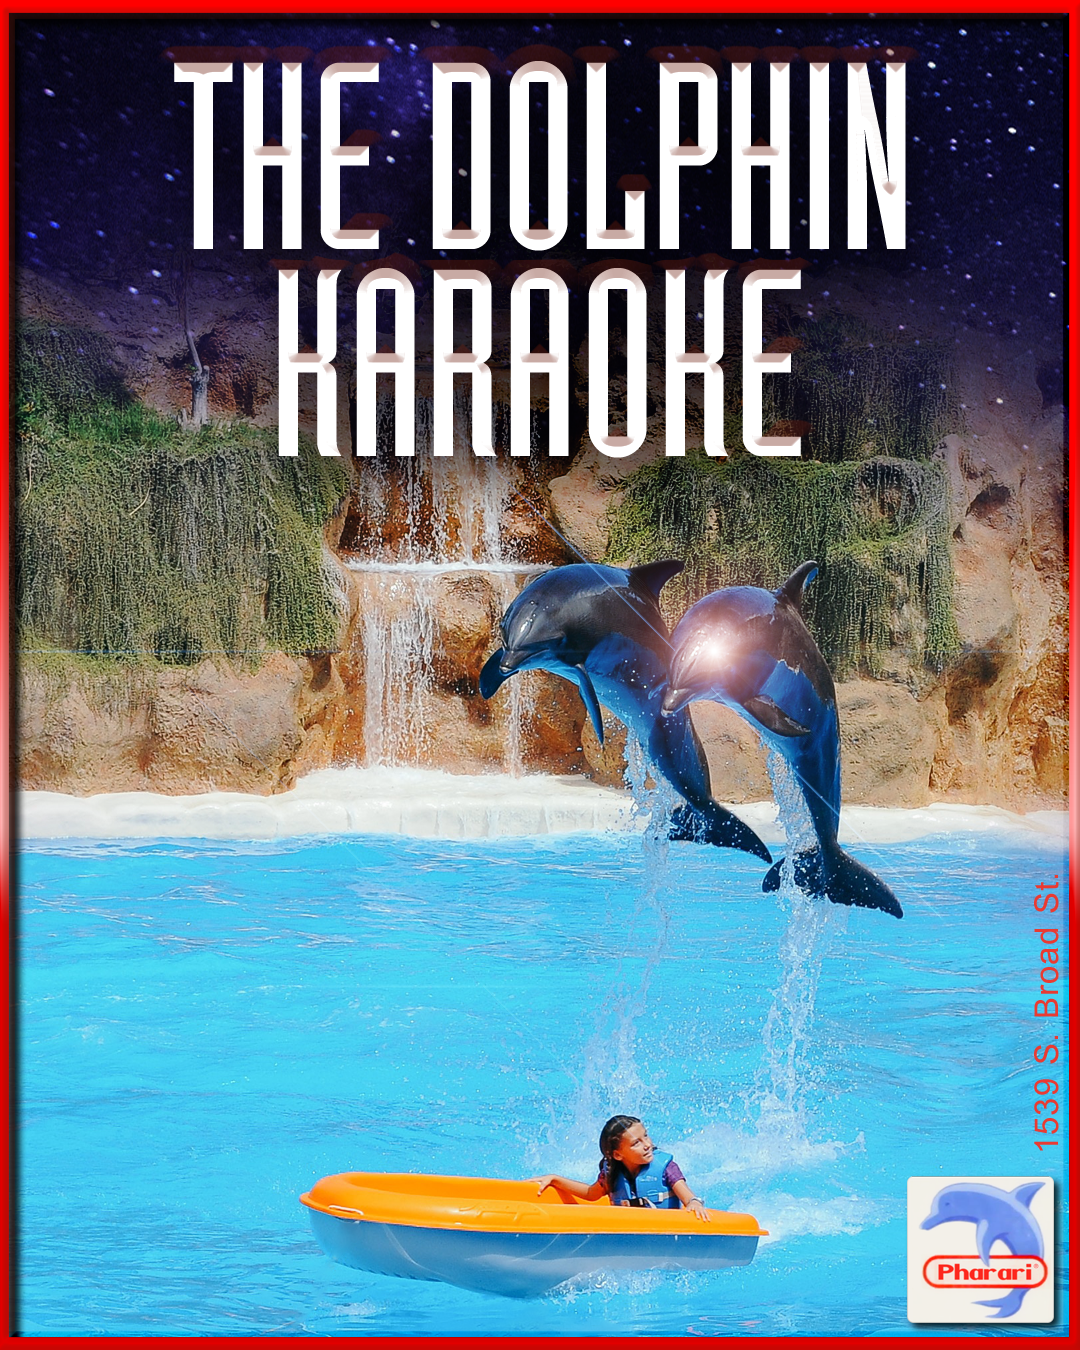 dolphin-karaoke-original.png